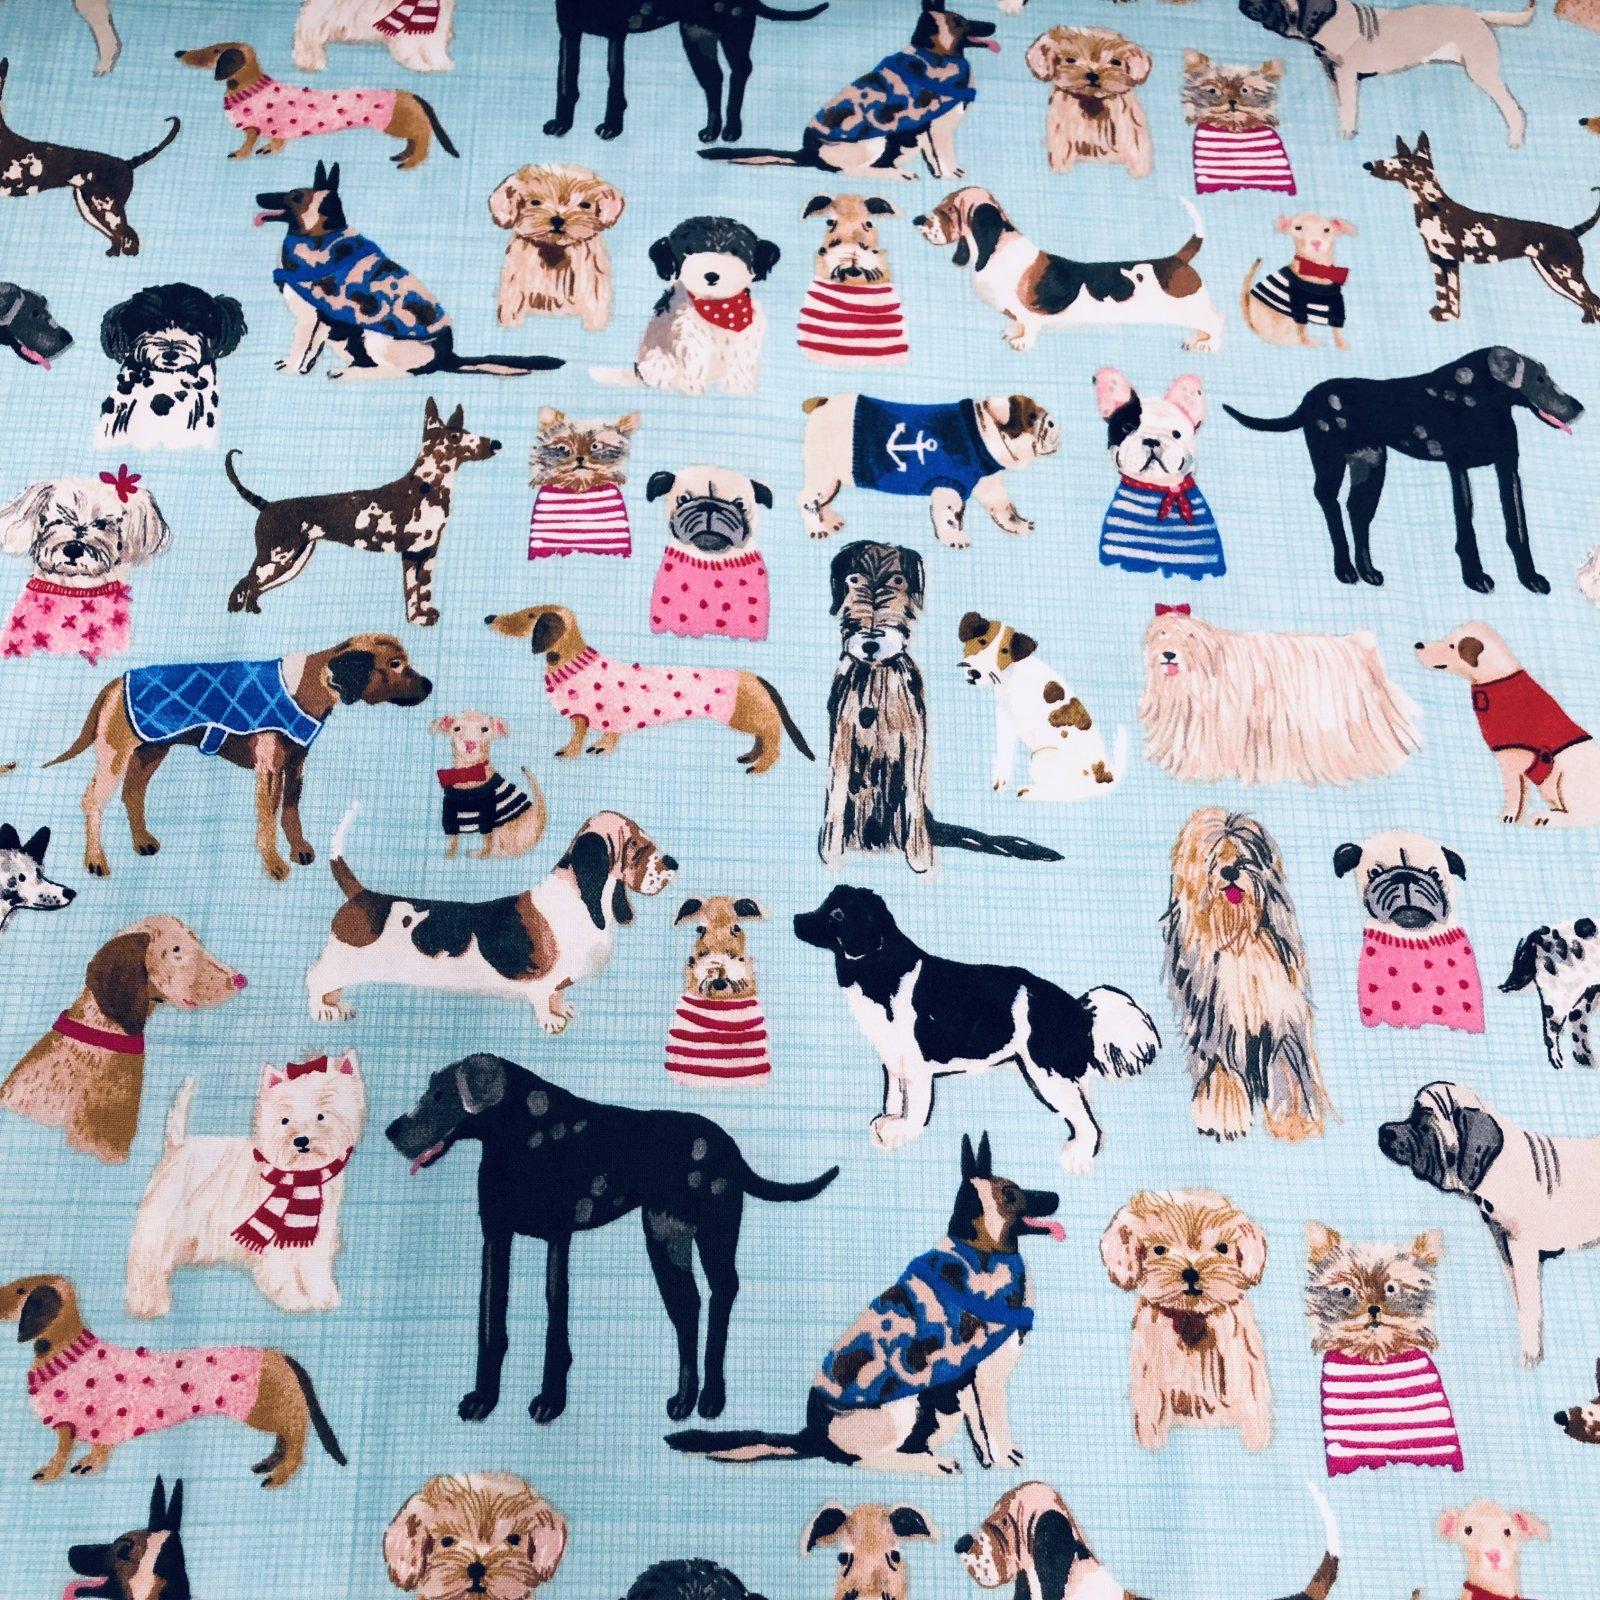 Windham Fabrics Hotdogs & Cool Cats